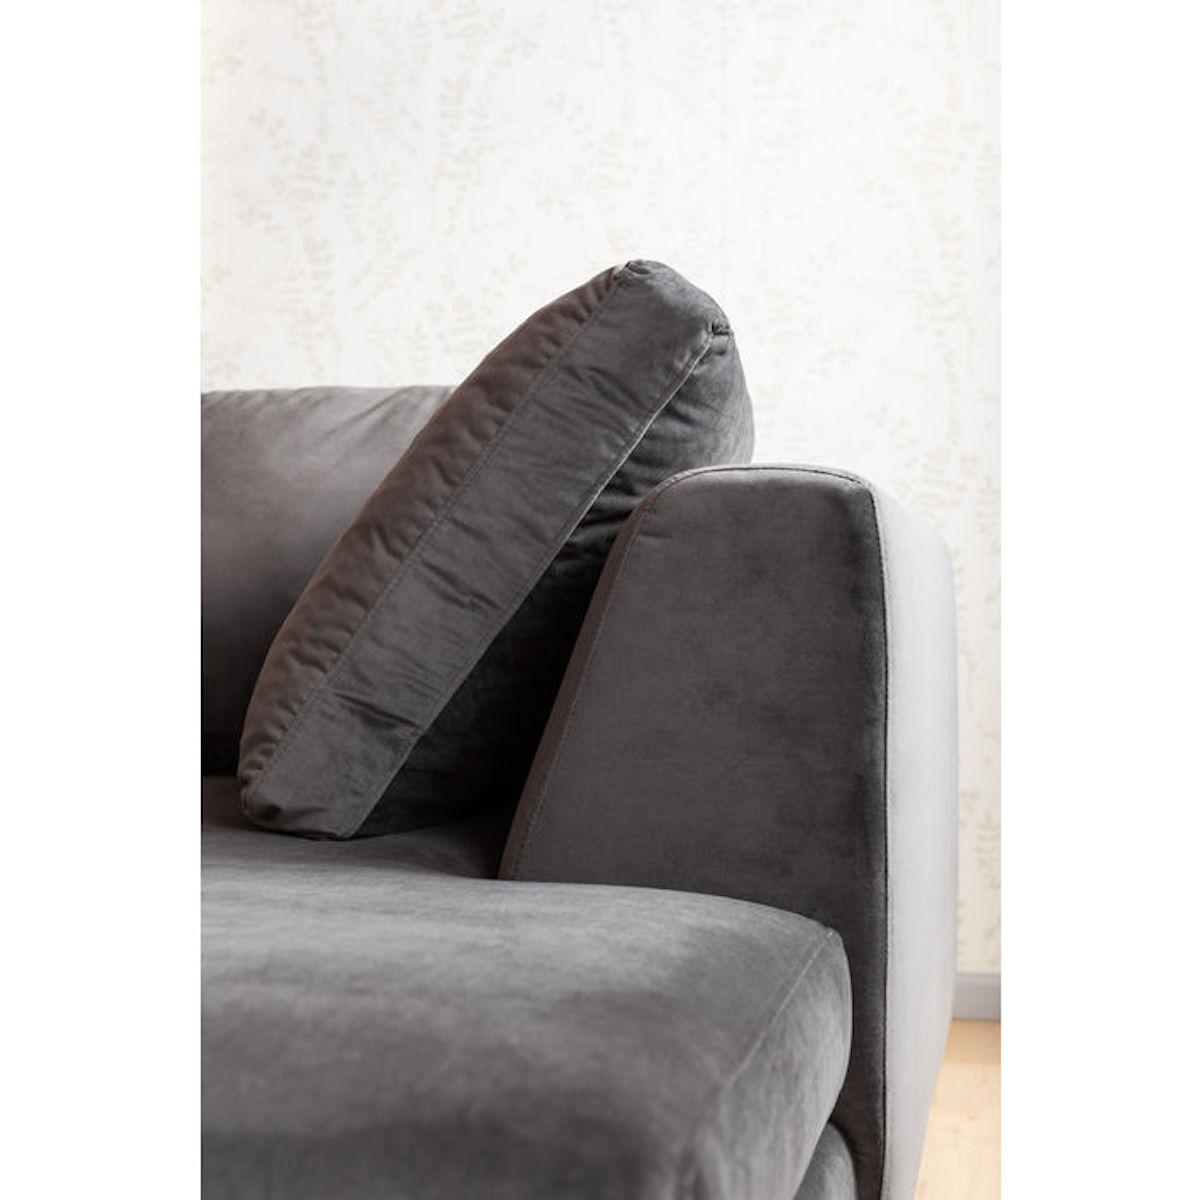 Canapé d'angle BLACK GIANNA Kare Design velours gris